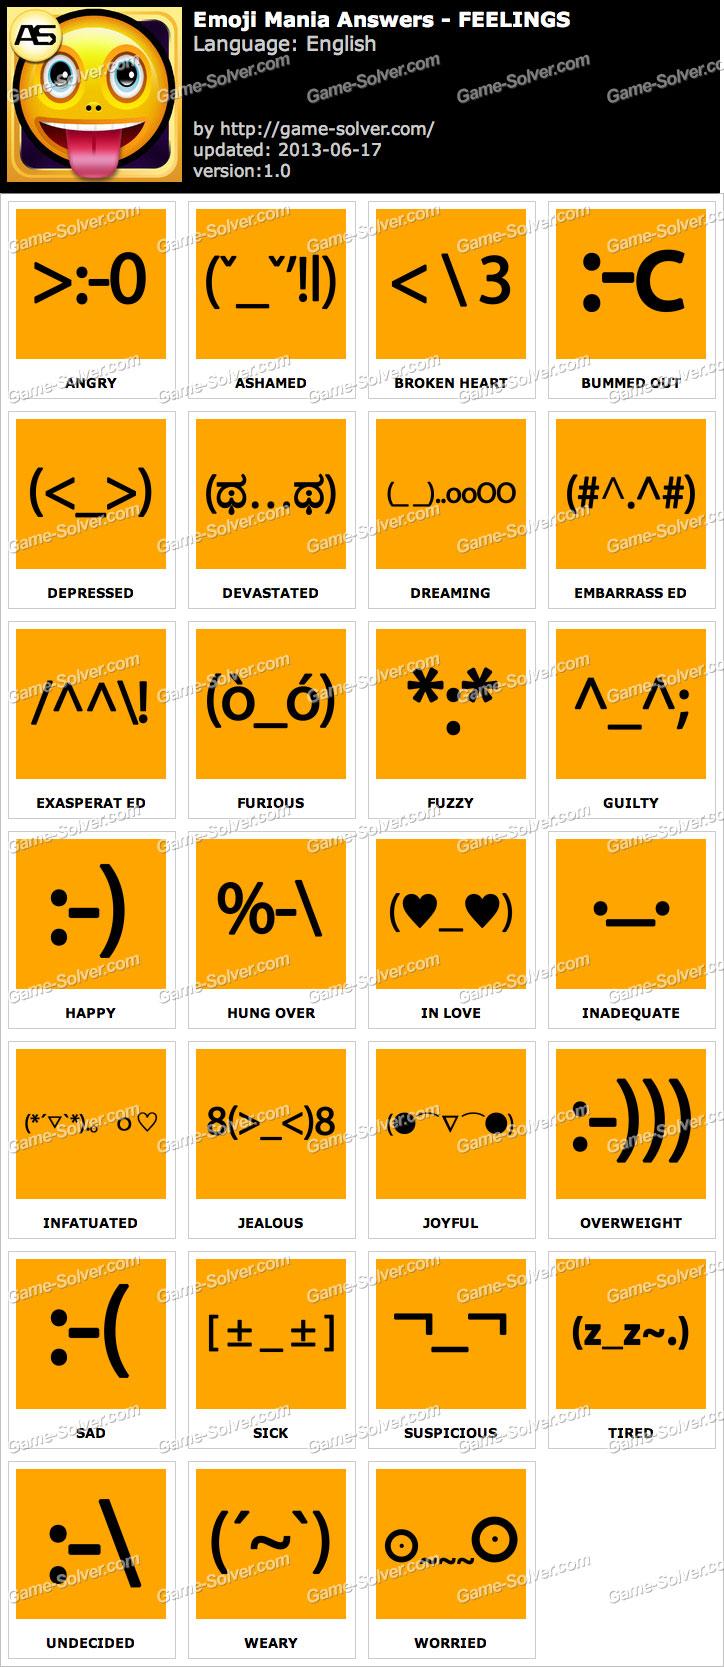 emoji mania feelings answers